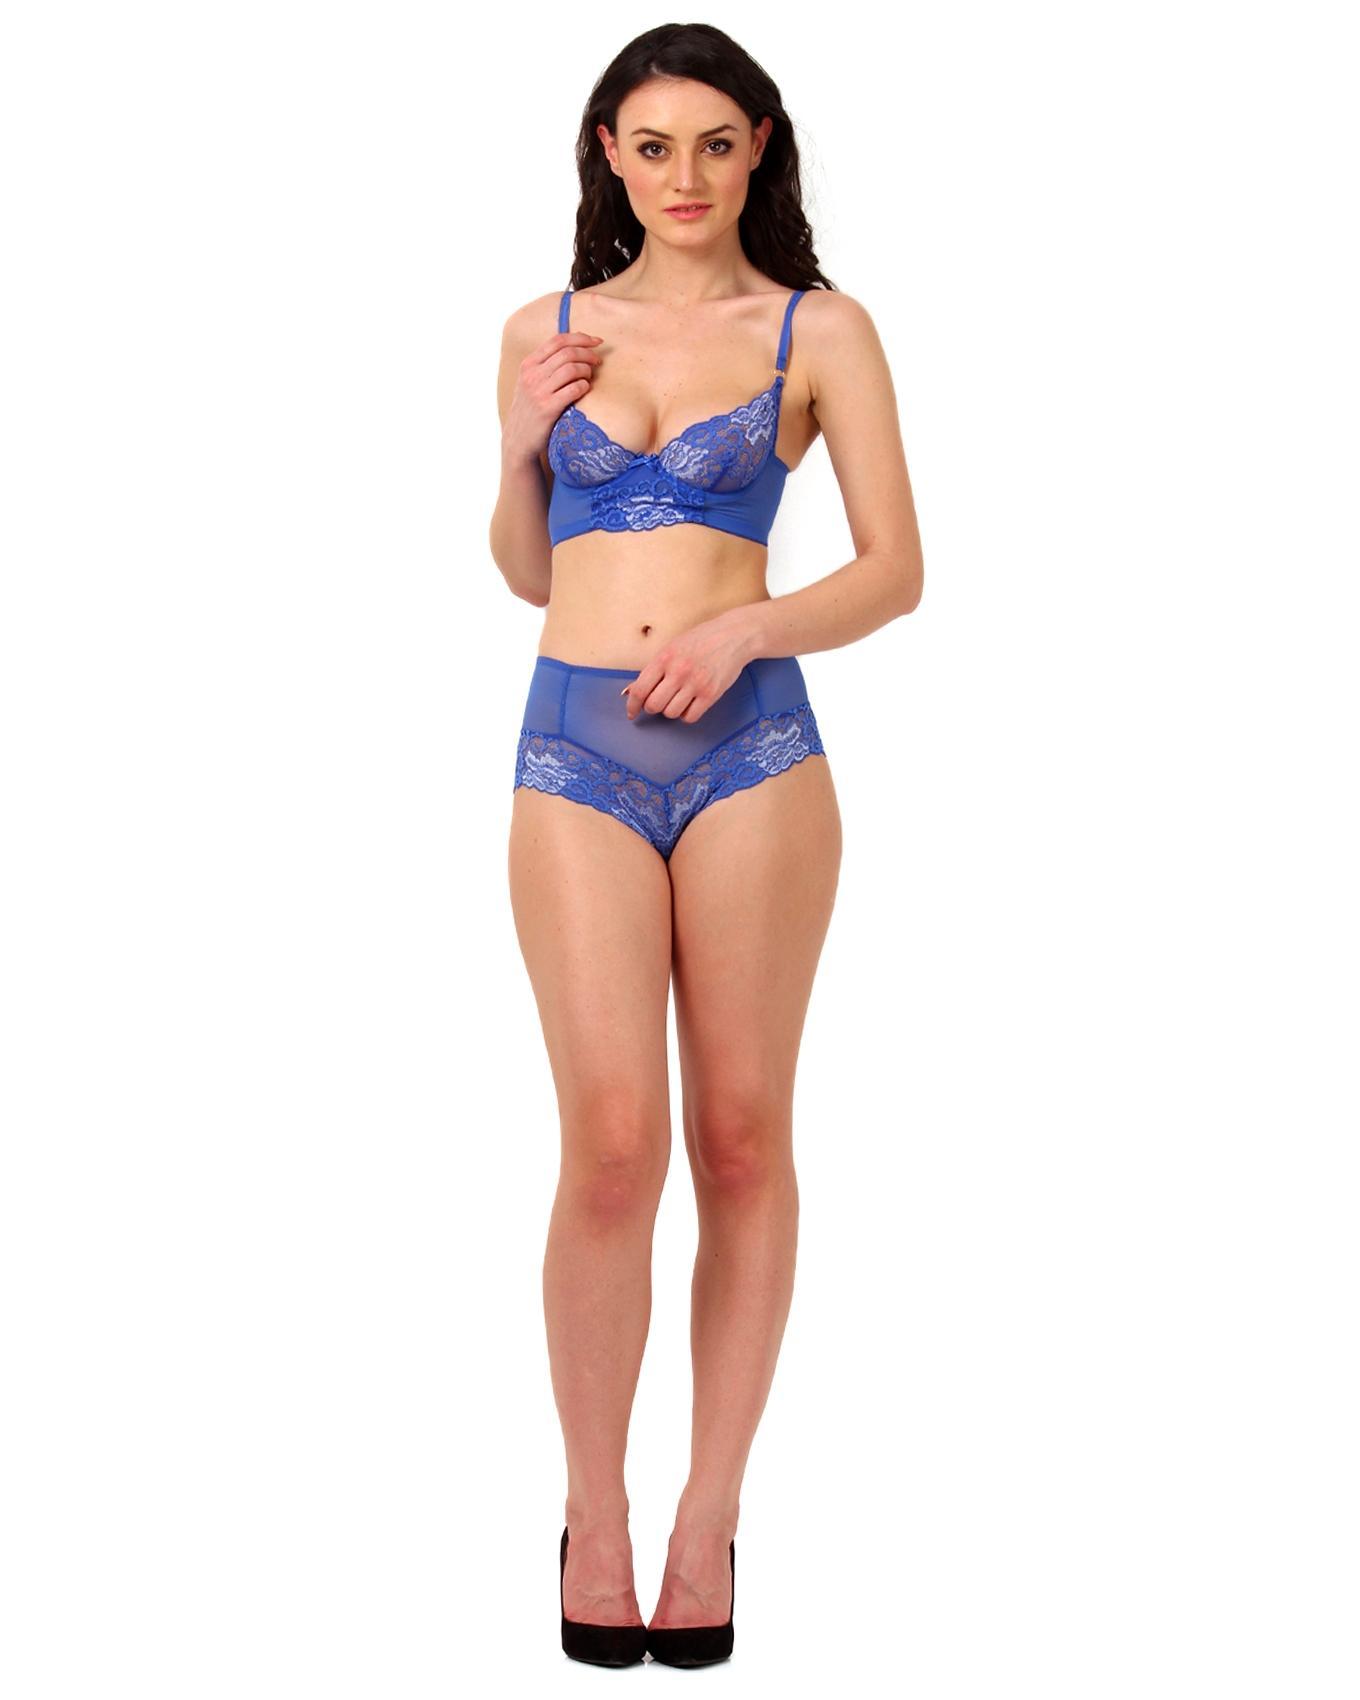 Women s Lace Longline Bra - Indigo  Buy Sell Online   Best Prices in  SriLanka  2c1b64a5e